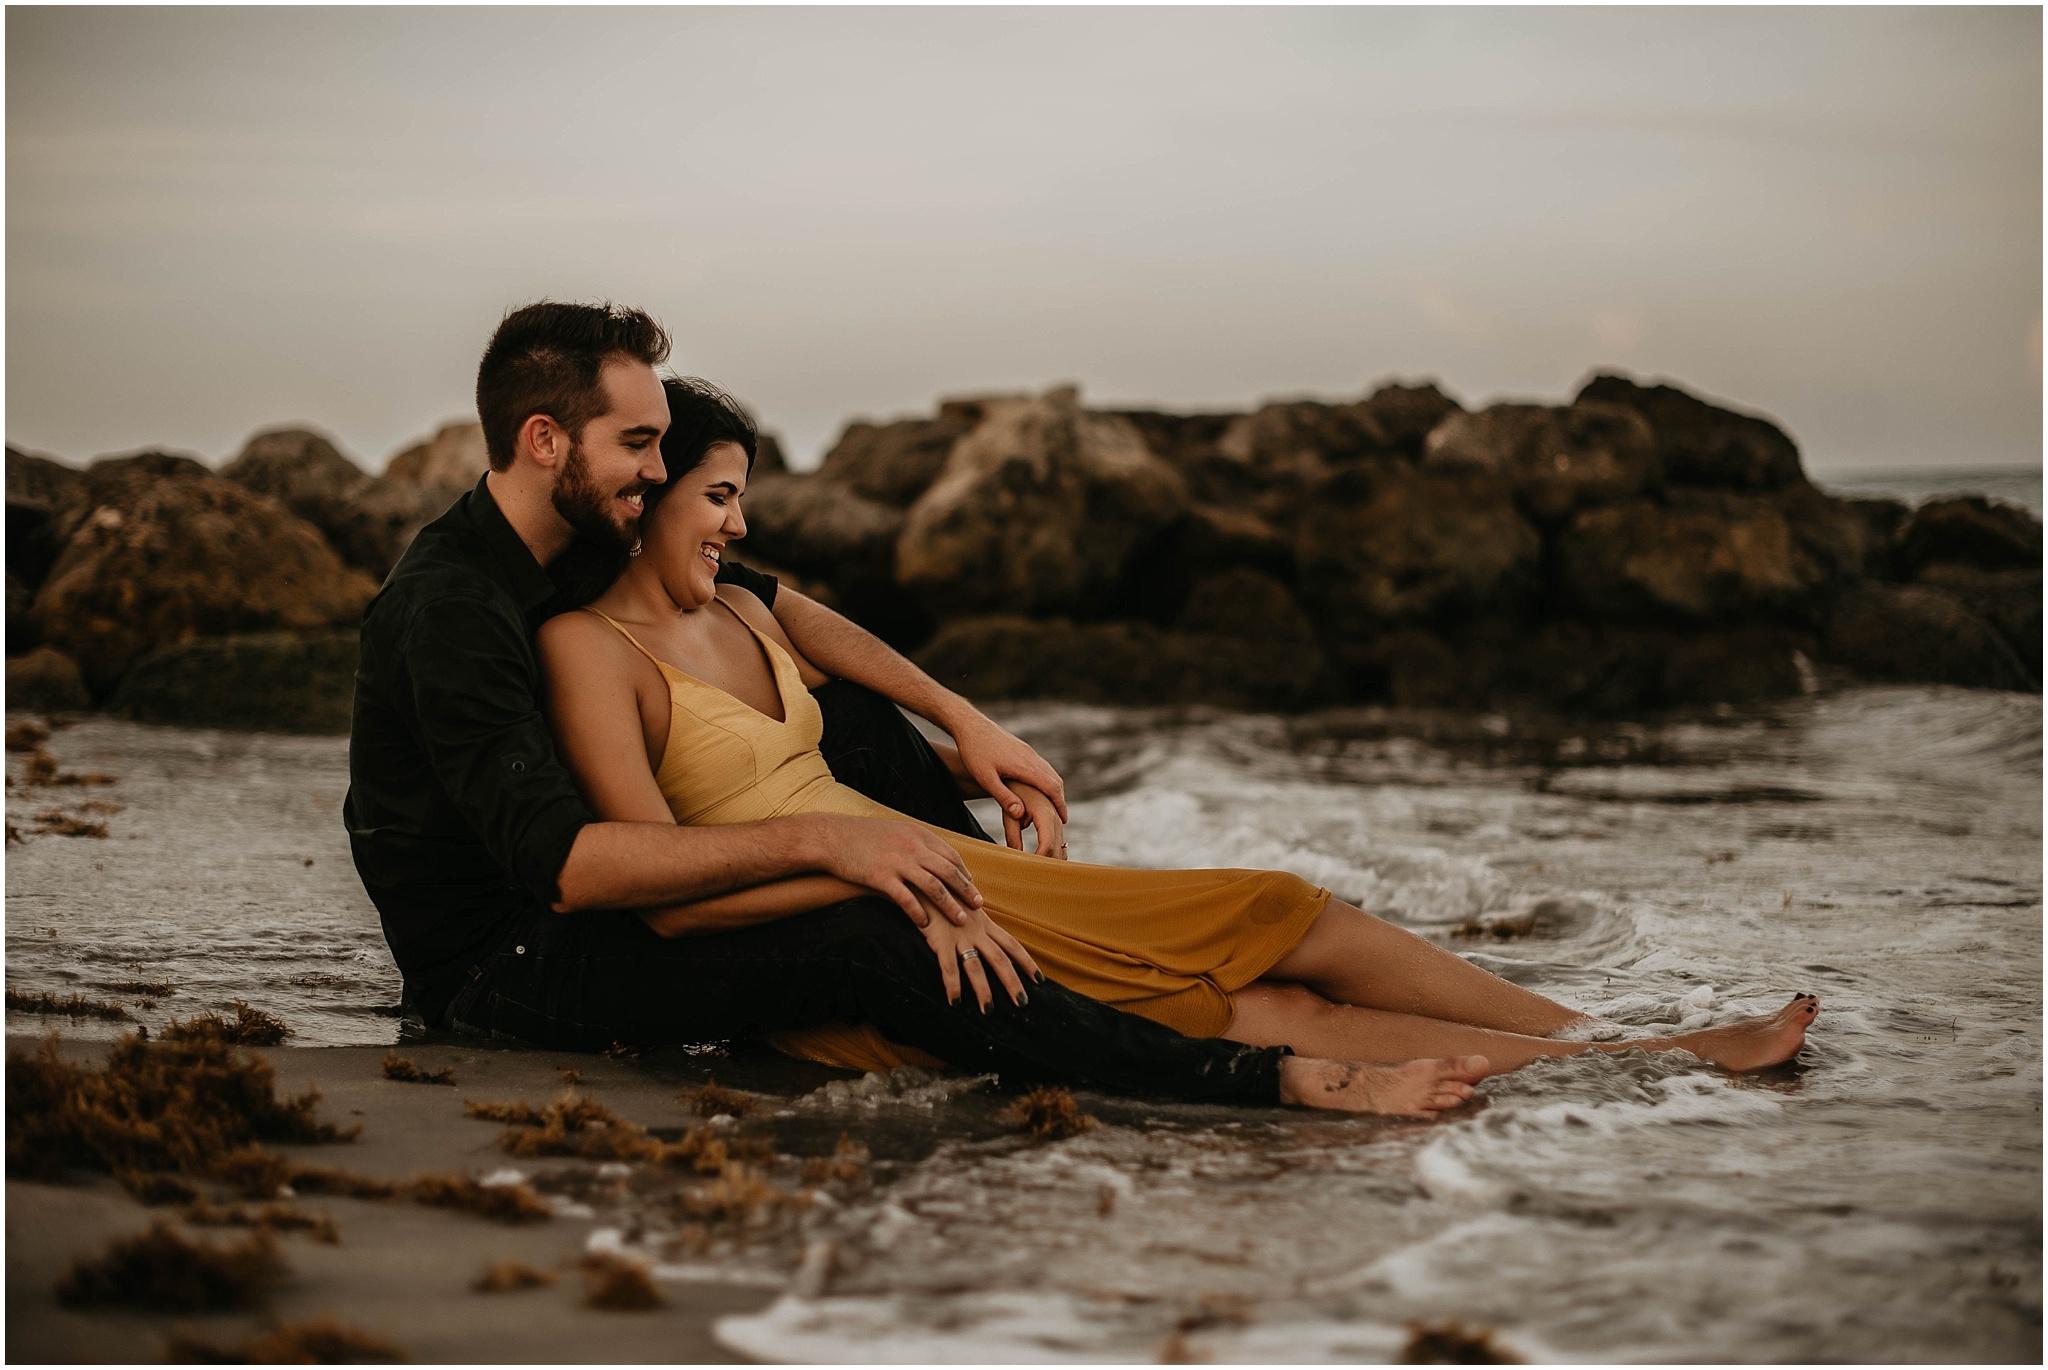 Worth-Avenue-Palm-Beach-engagement-photographer_0031.jpg